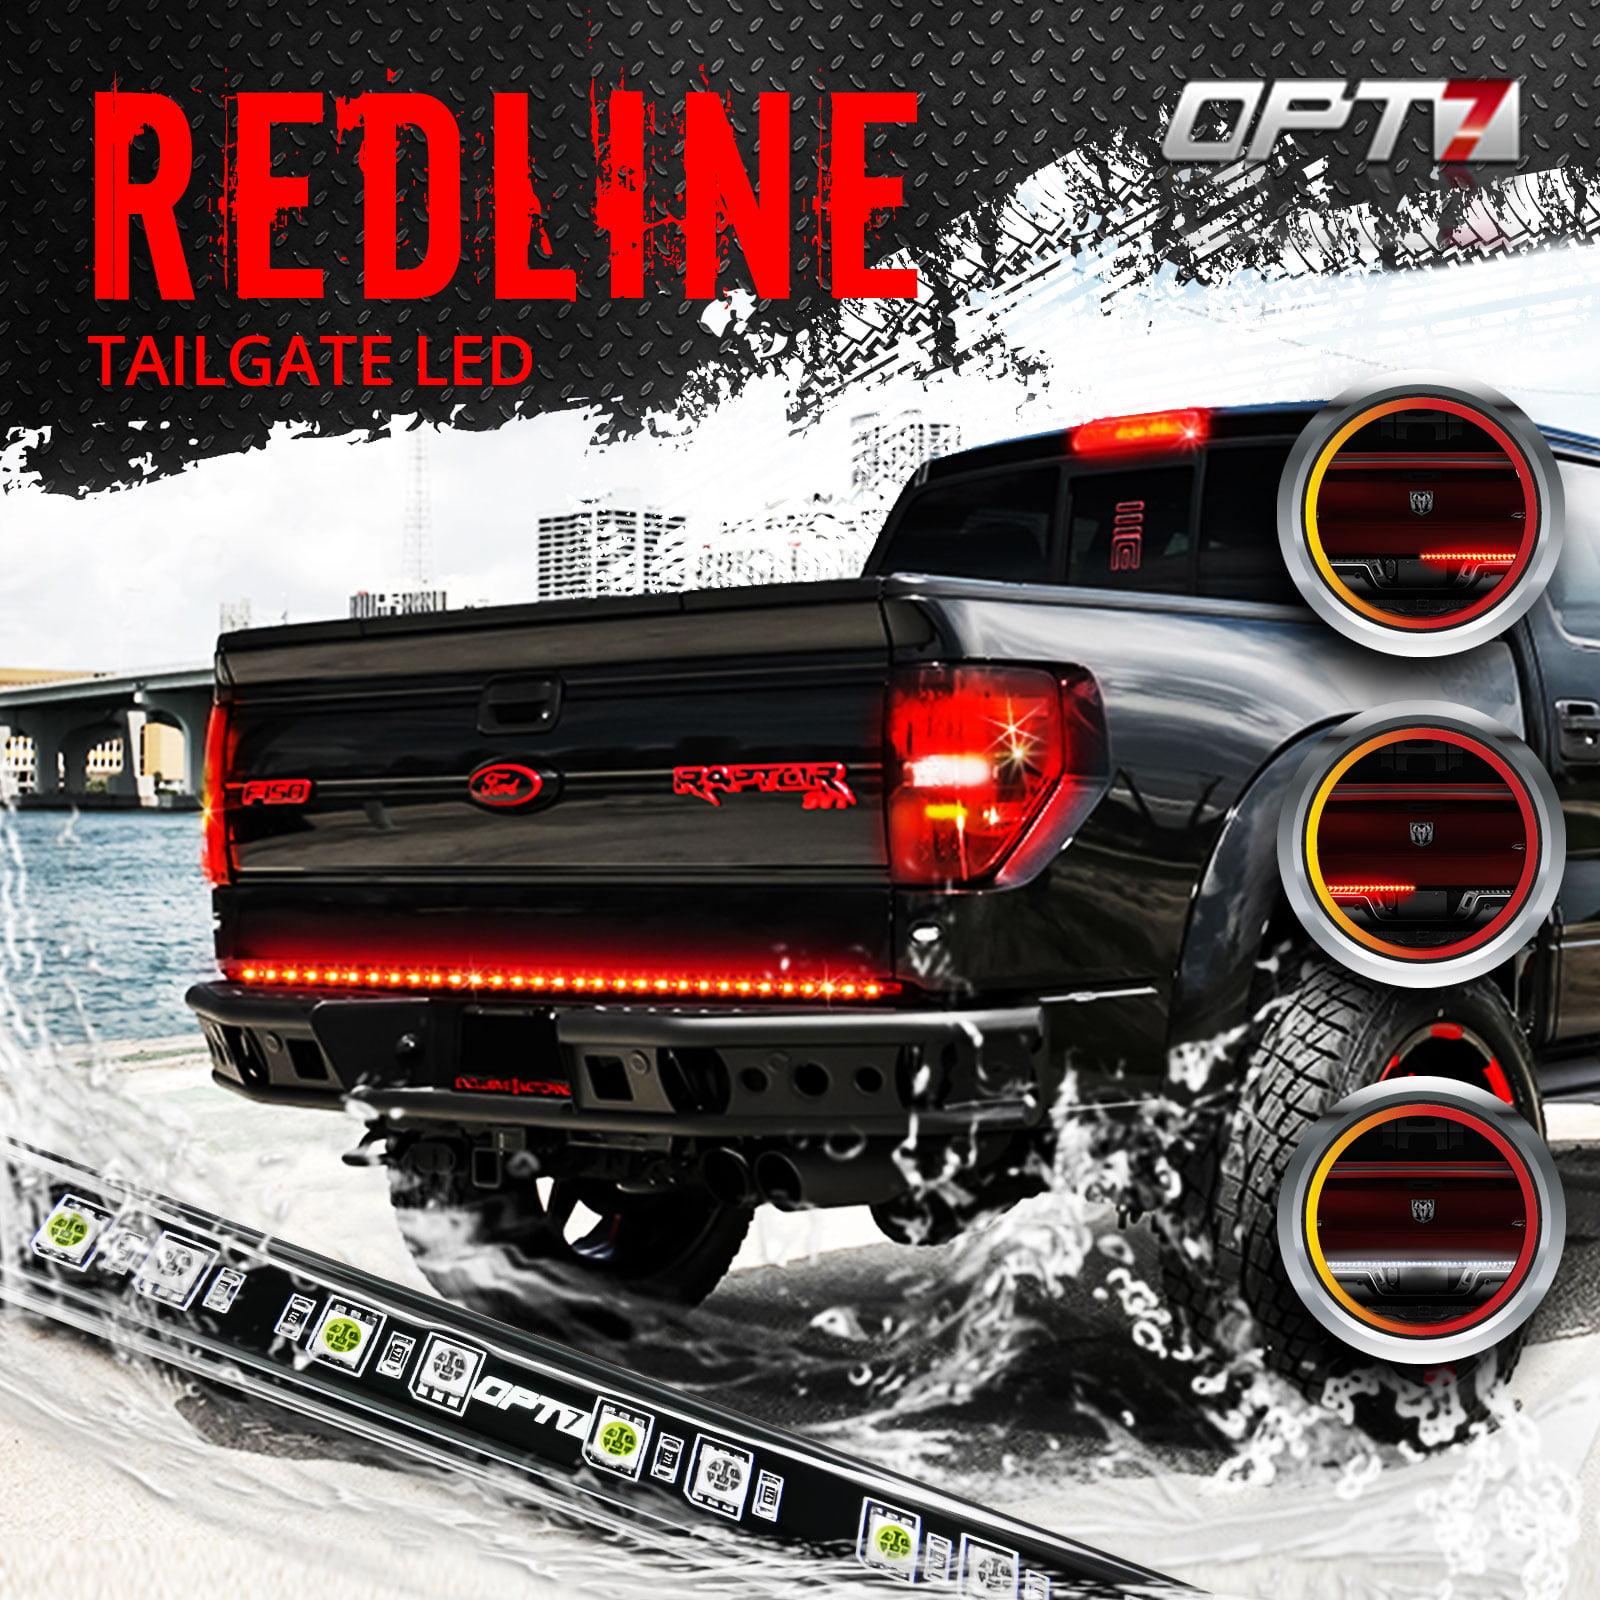 "60"" Redline LED Tailgate Light Bar - Tri-Core LED - Weatherproof - Full Function - 2yr Warranty - Easy Screw-Less Install - Durable Rigid Aluminum - Reverse Signal Running Brake - Rain or Snow"